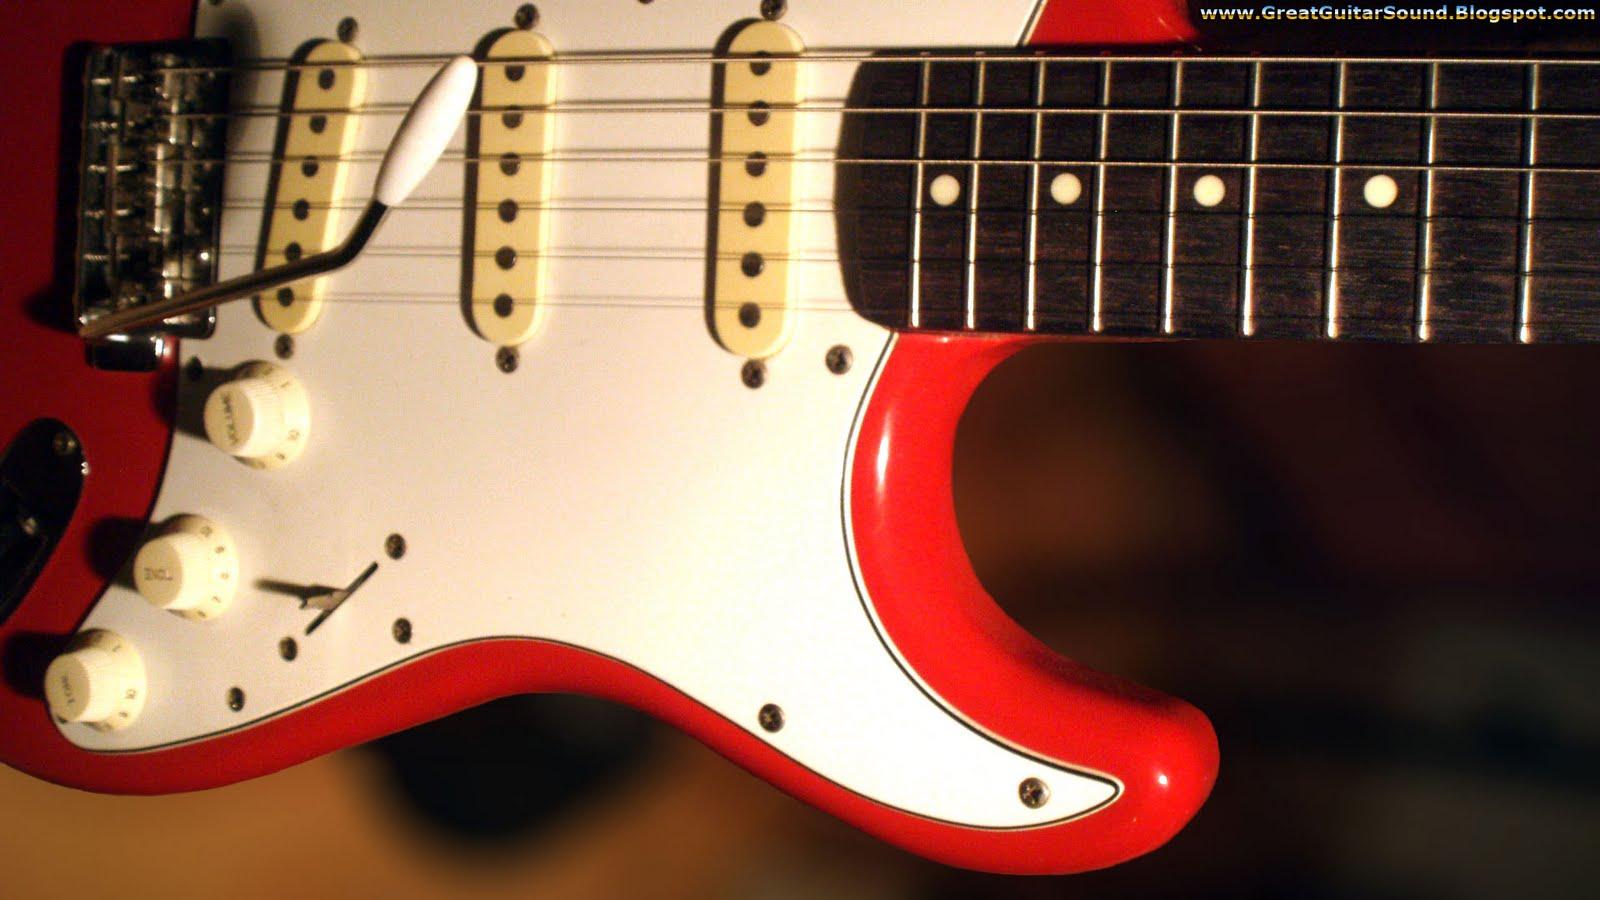 Electric guitar wallpaper   HD Wallpapers Source HD Wallpapers 1600x900